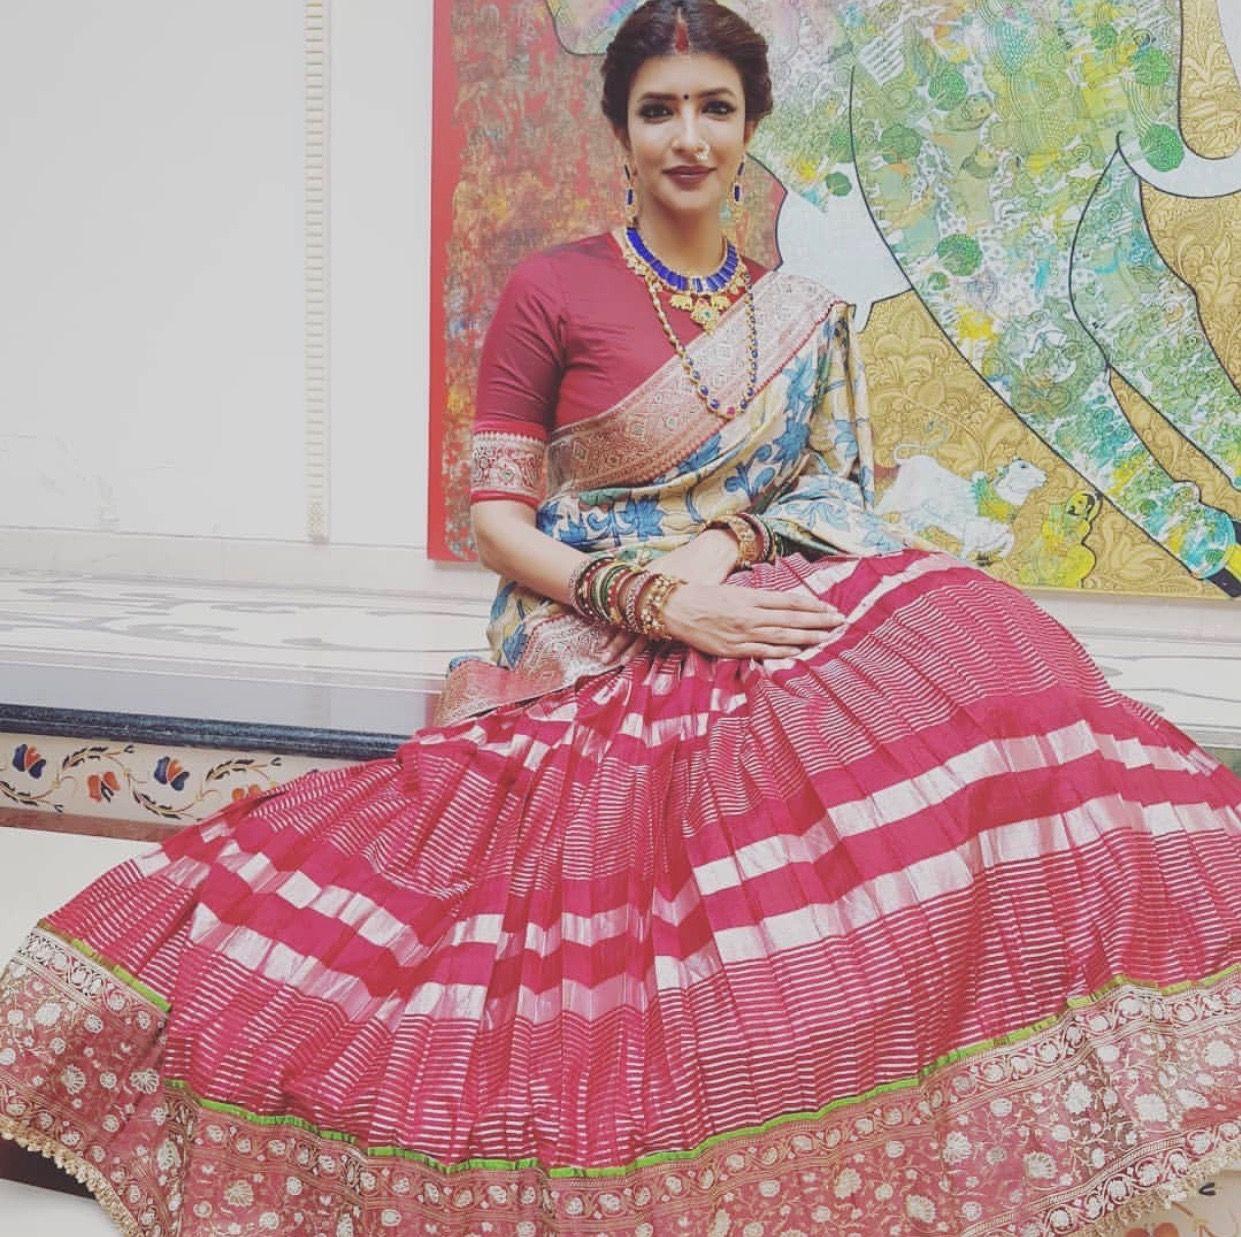 Pin de Sujatha en Saree | Pinterest